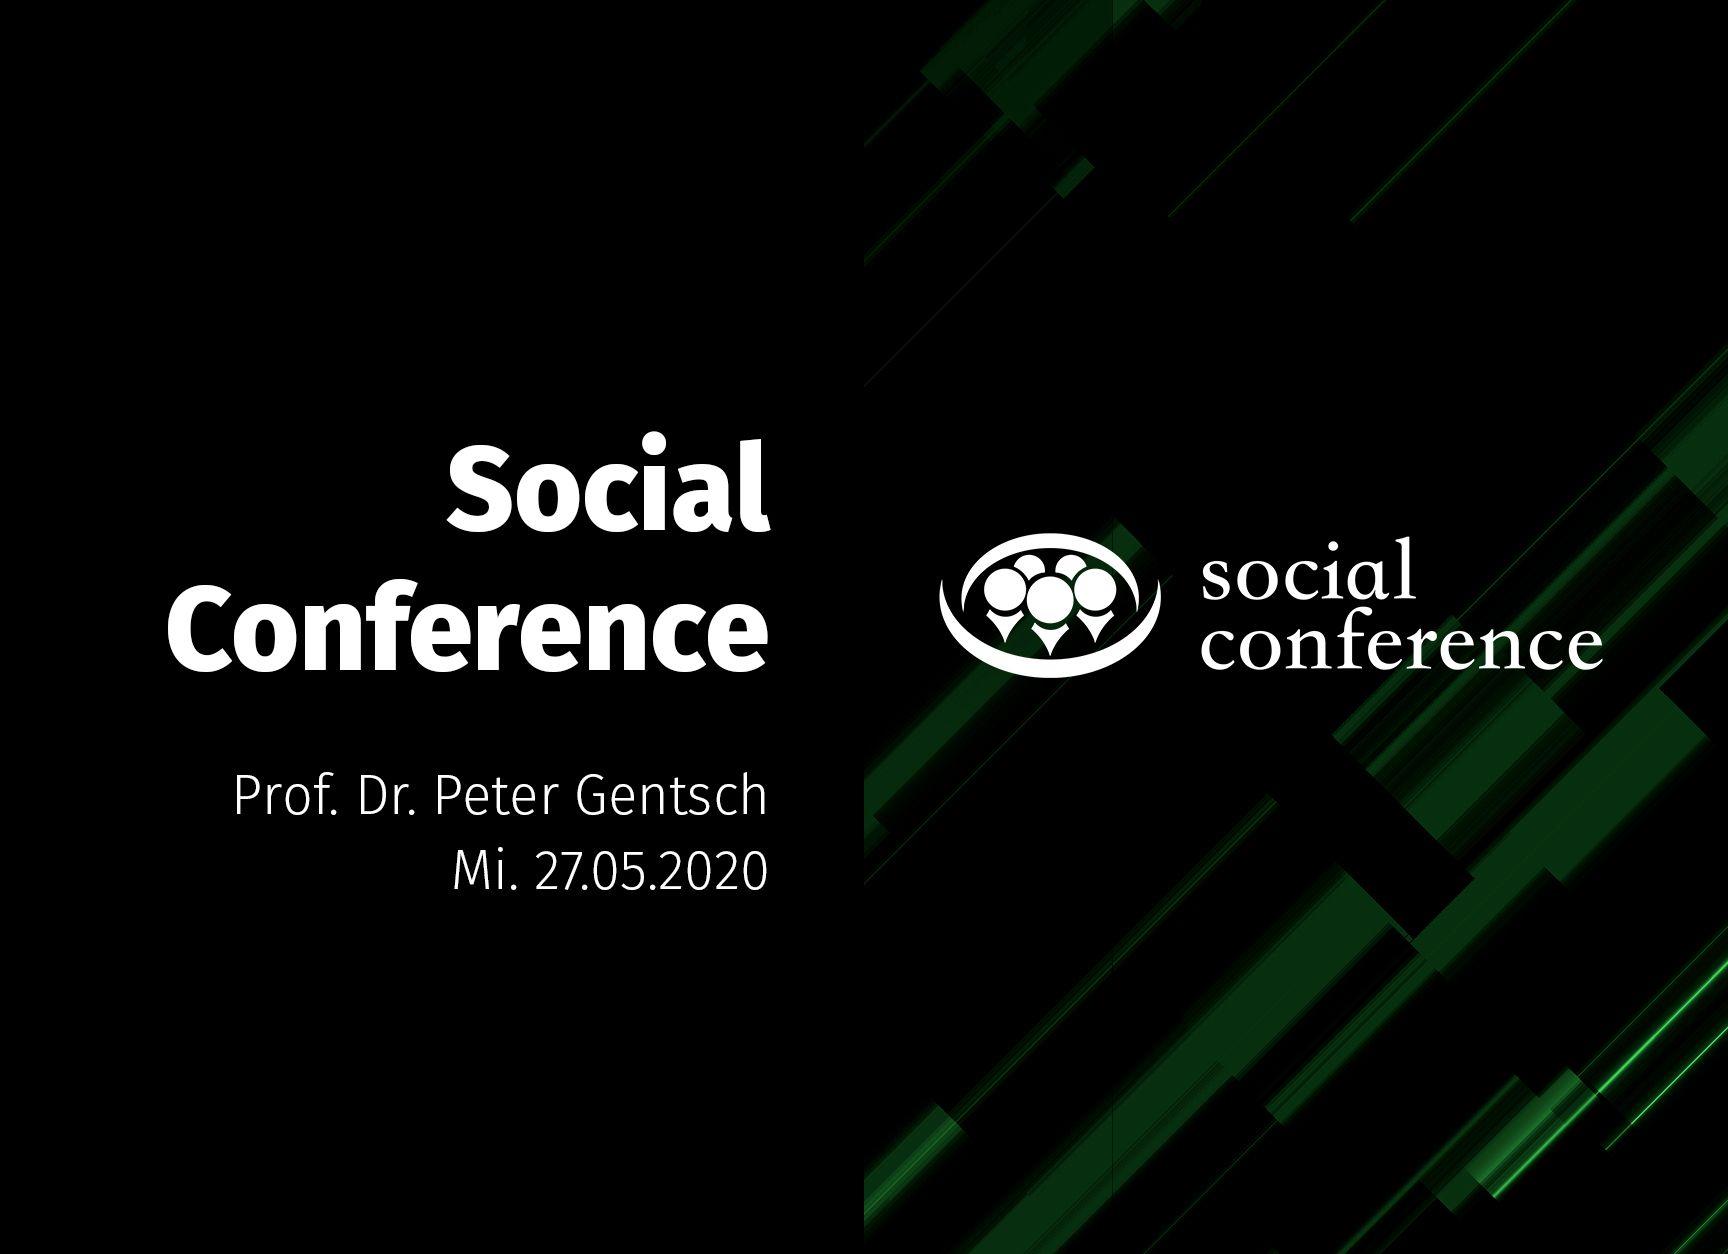 Social Conference 2020: diva-e war dabei